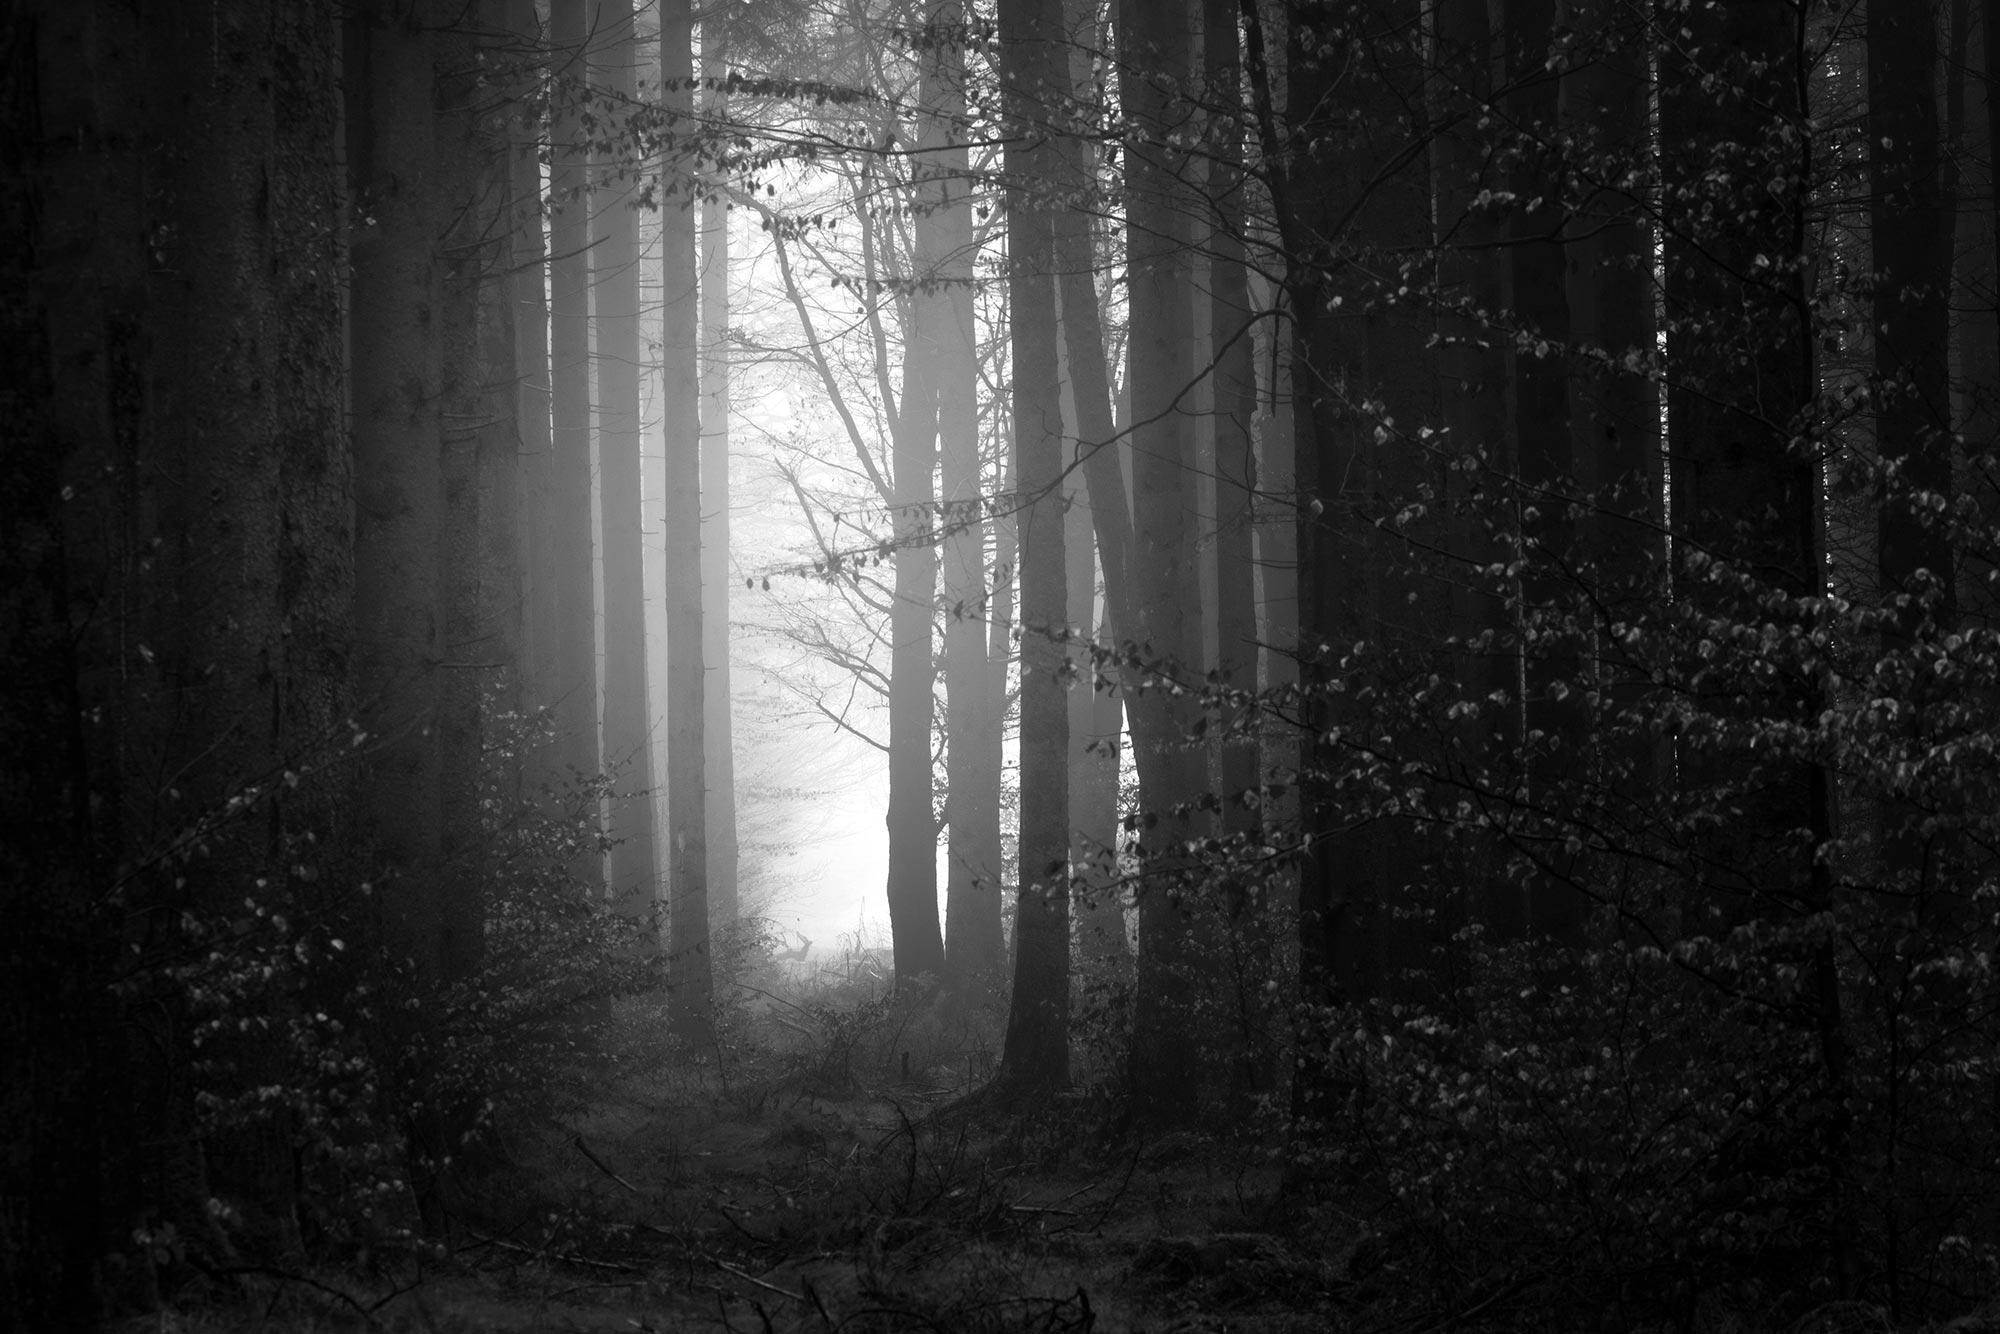 https://kobedigital.com/wp-content/uploads/2020/12/ServicesStudios_OurApproach_Trees_01.jpg